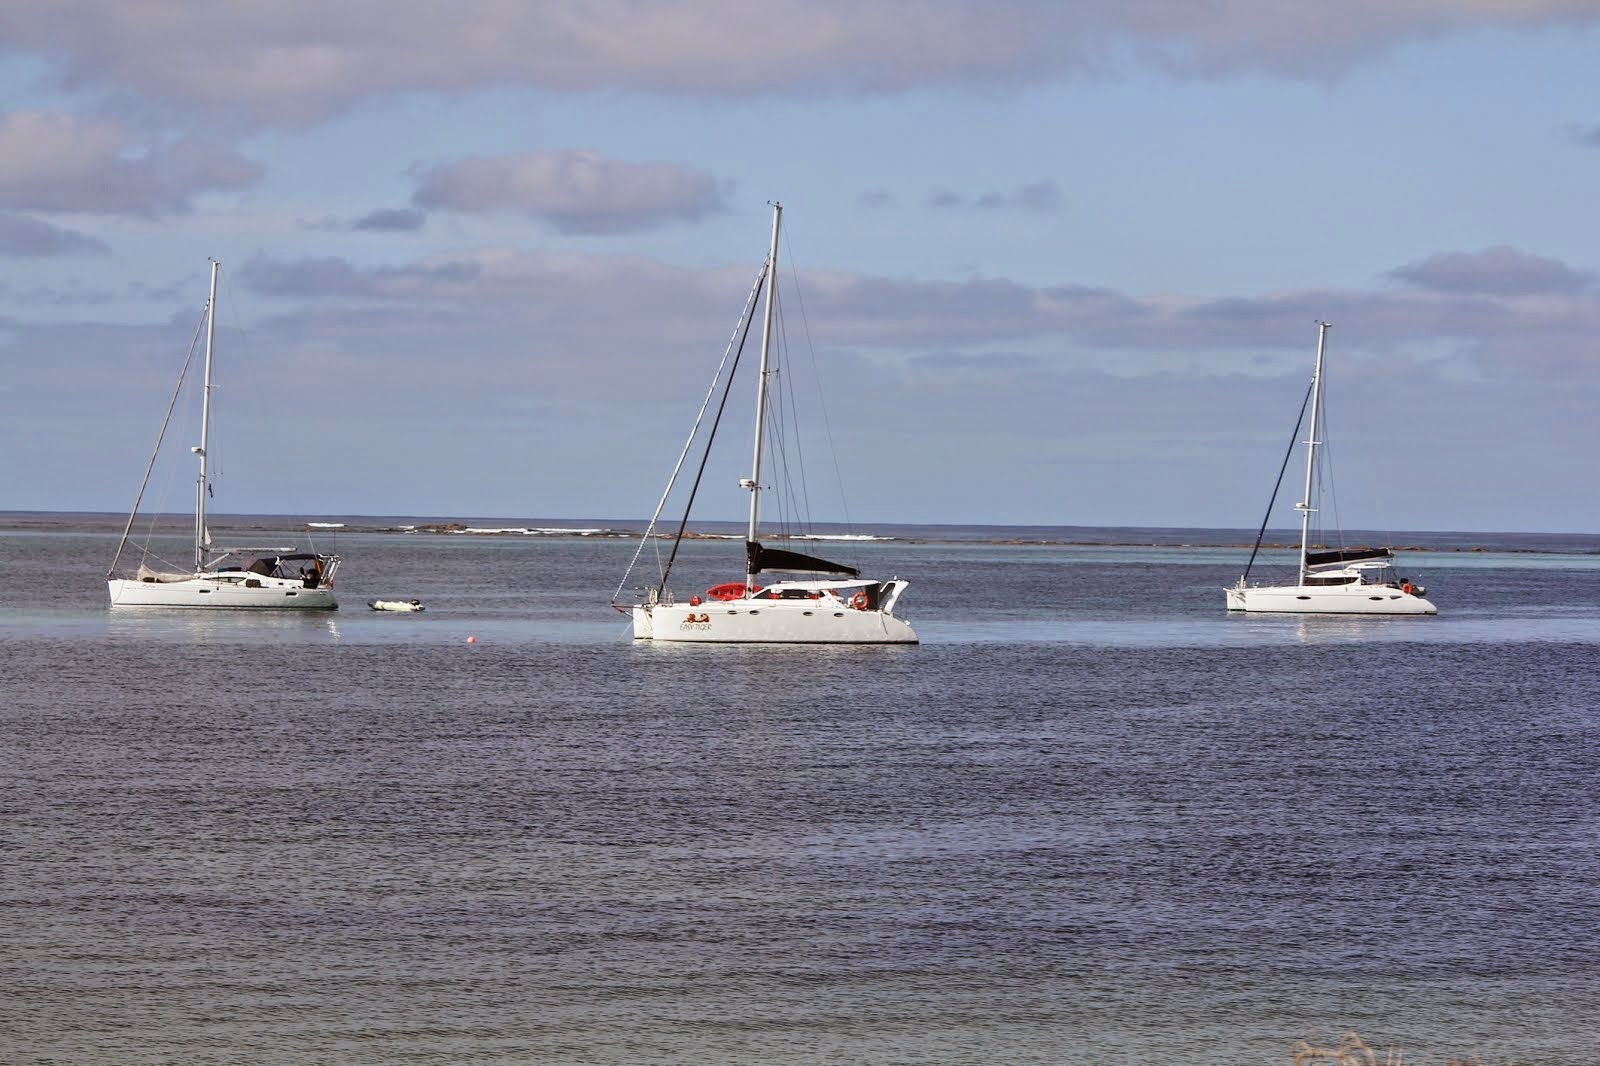 Our Sailing trio in Hopetoun WA